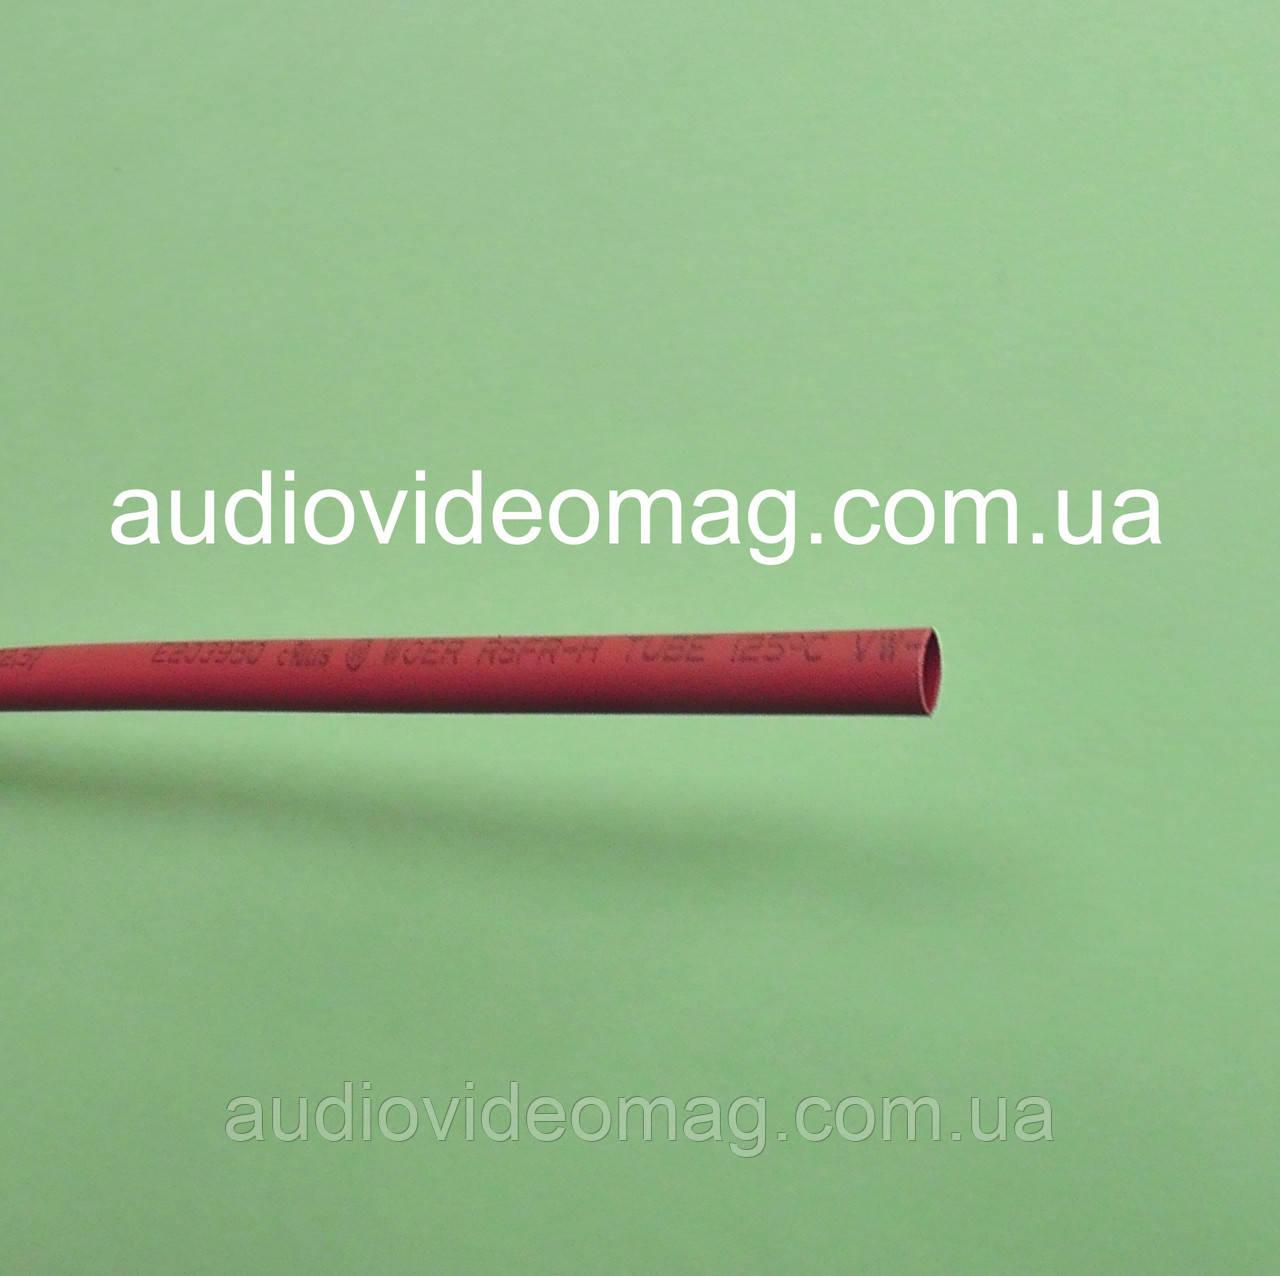 Термоусадочная трубка (2:1) - 2.5/1.25 мм, 1 метр, красная